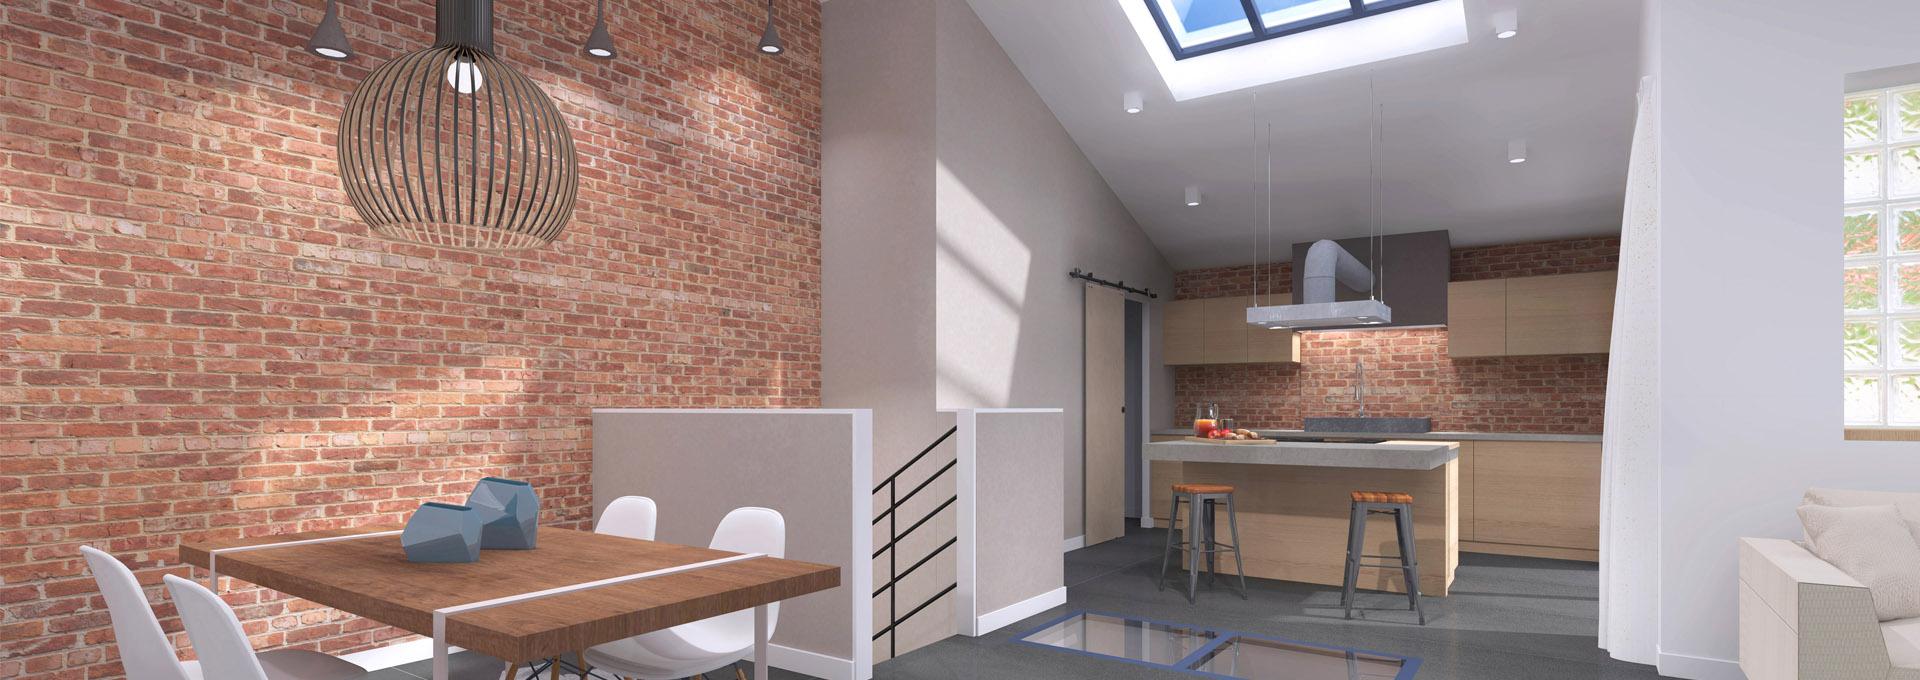 Transformation hangar en loft industriel en duplex avec mur de brique